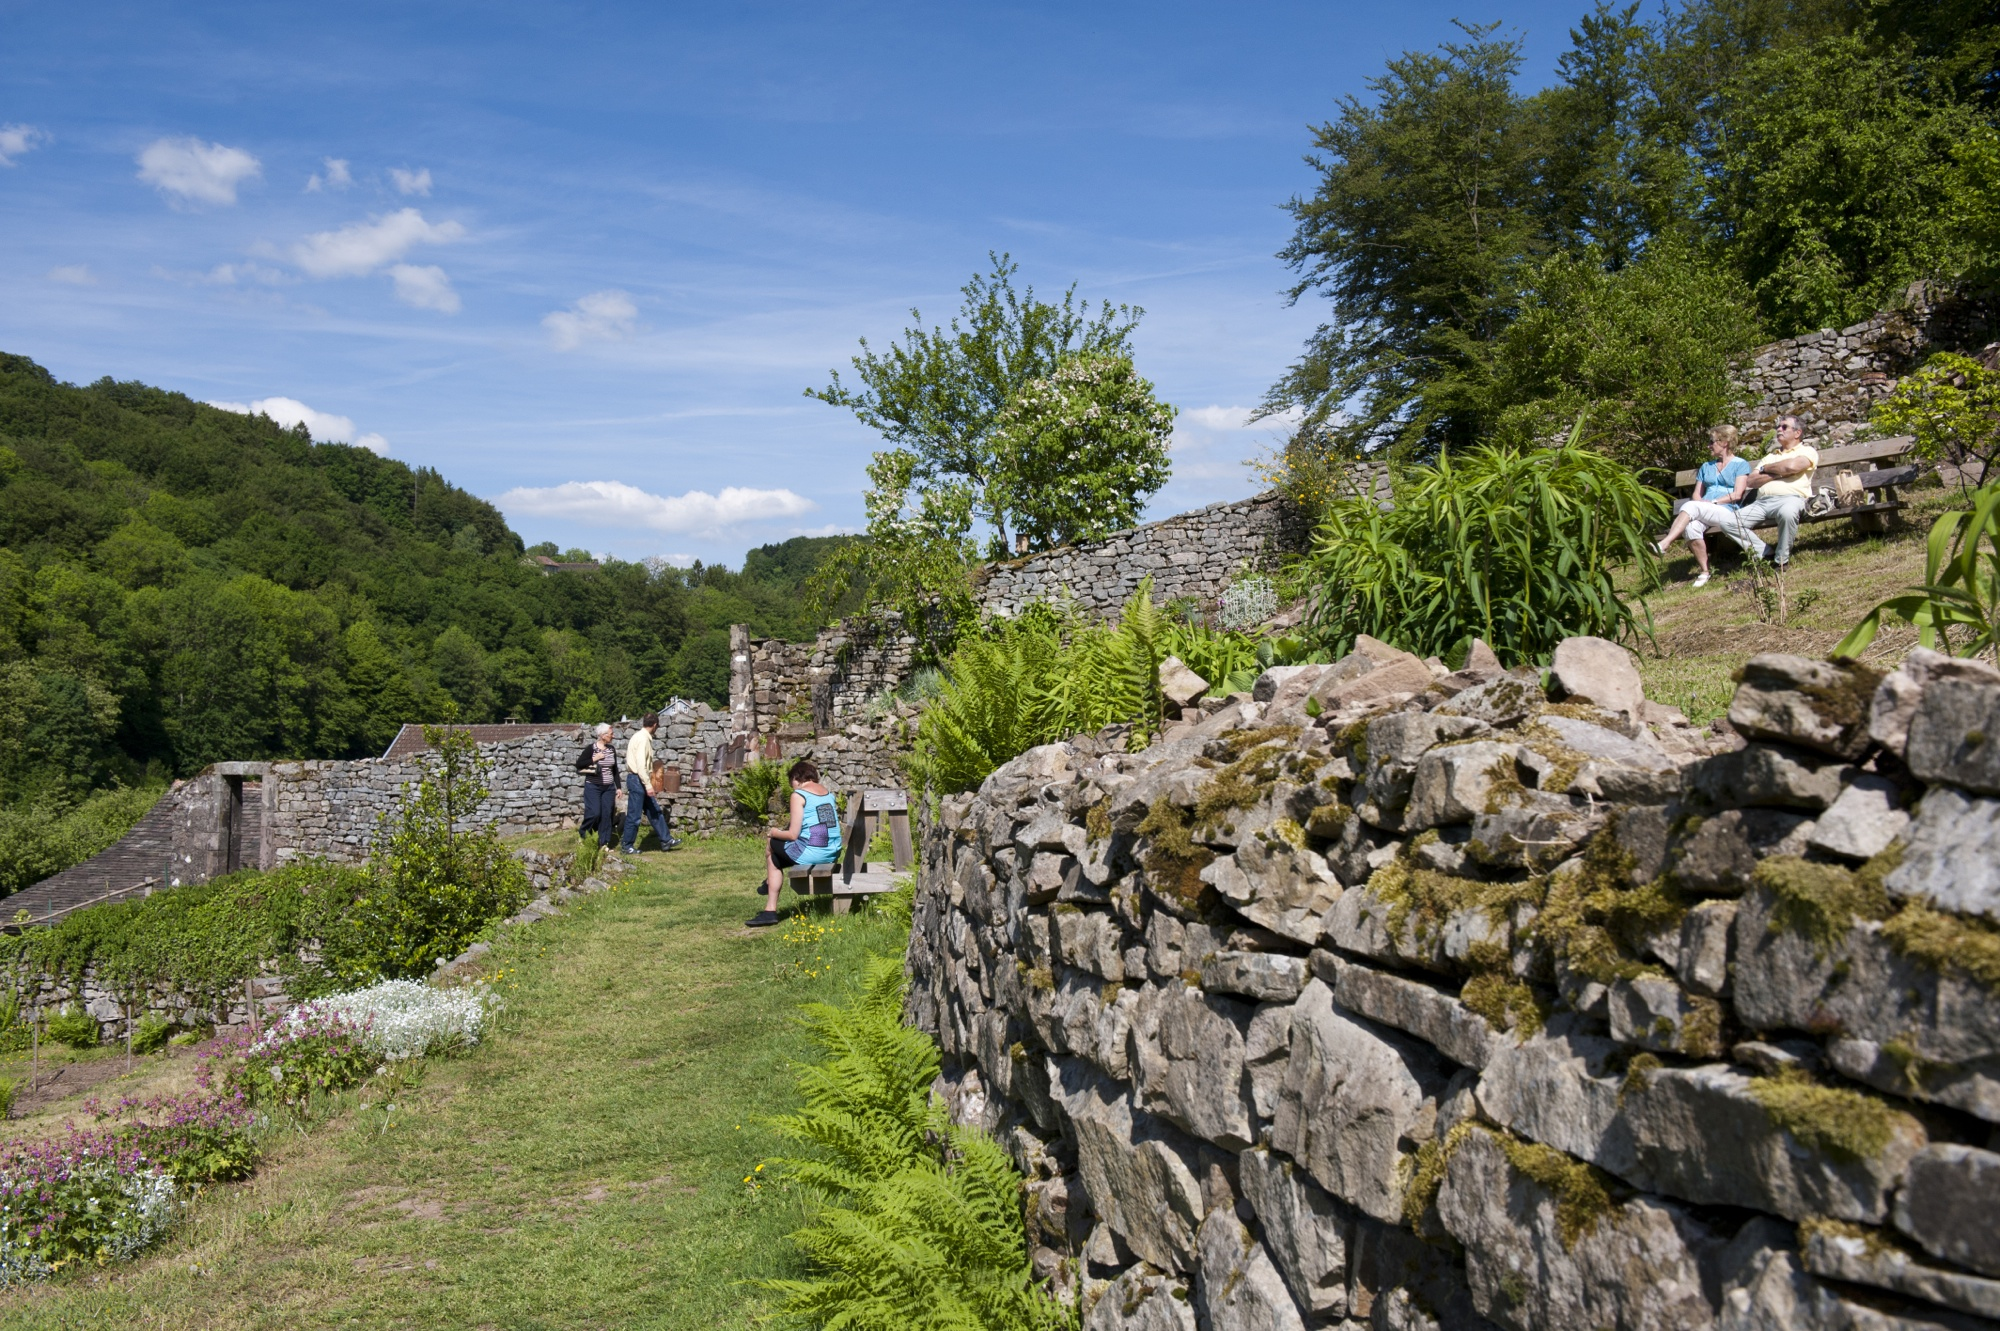 Les Jardins en terrasses Plombi¨res les Bains